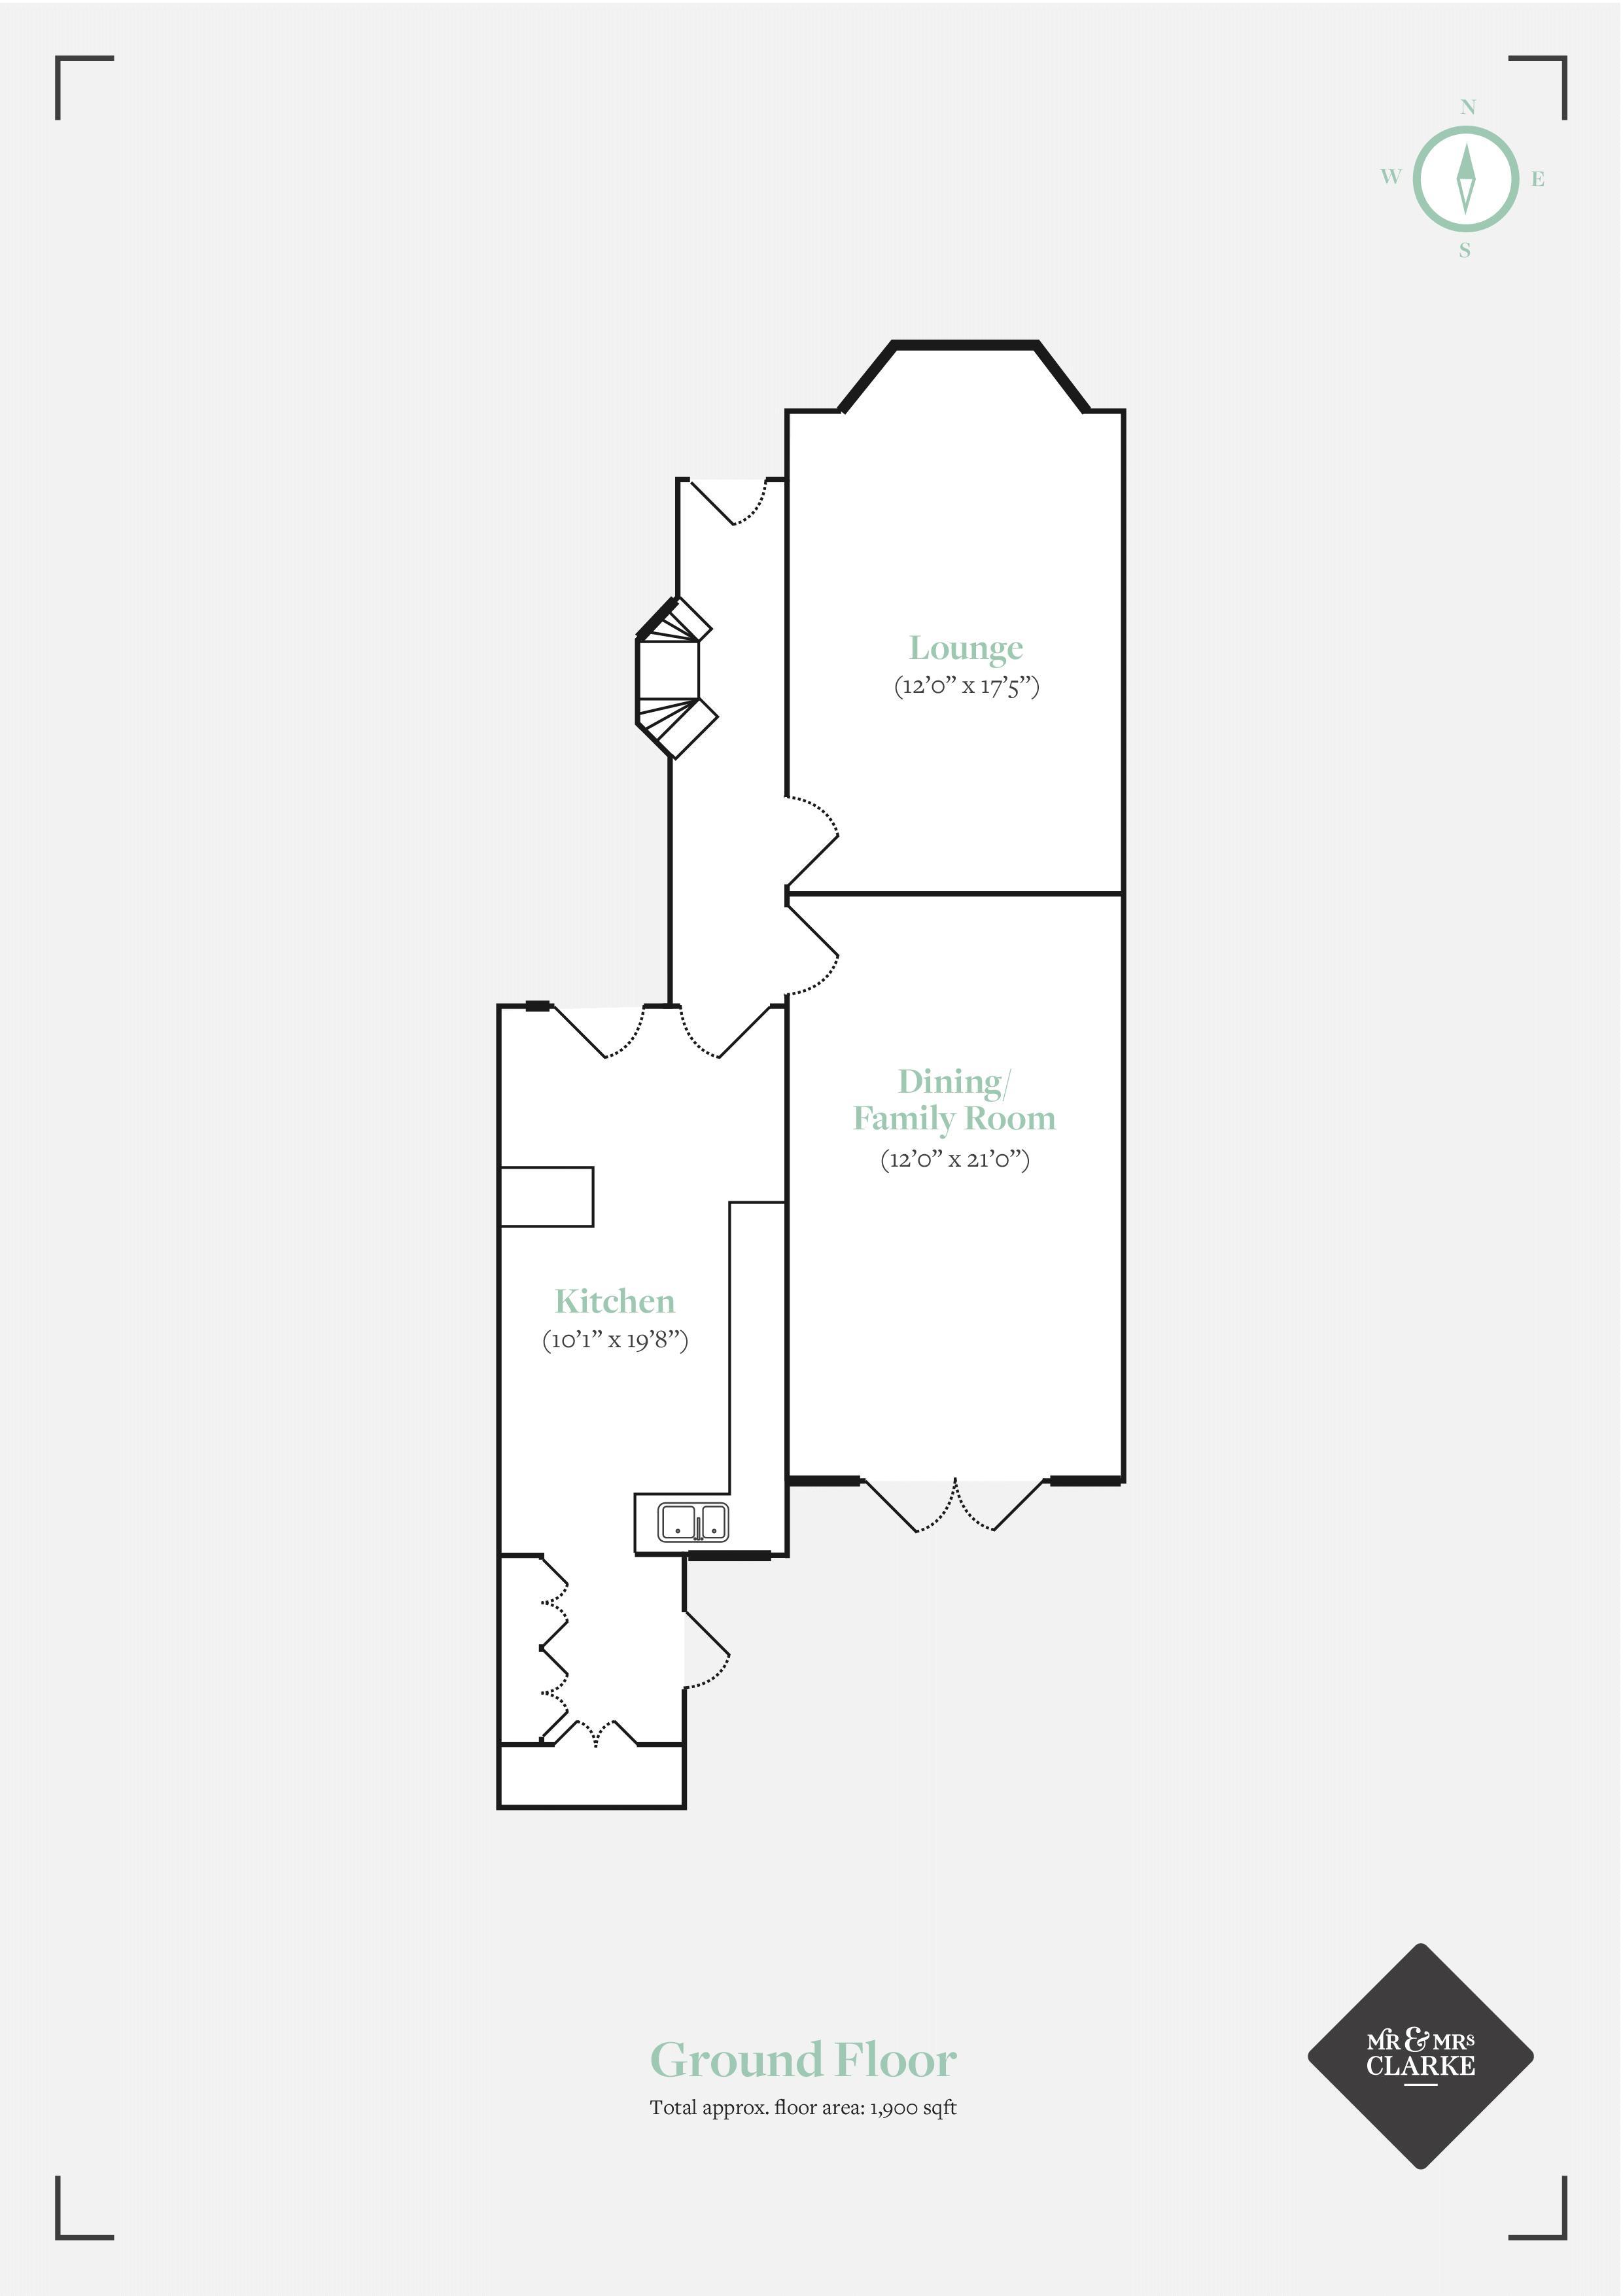 Manor Grove, Tonbridge. Floorplan. Ground Floor Plan.